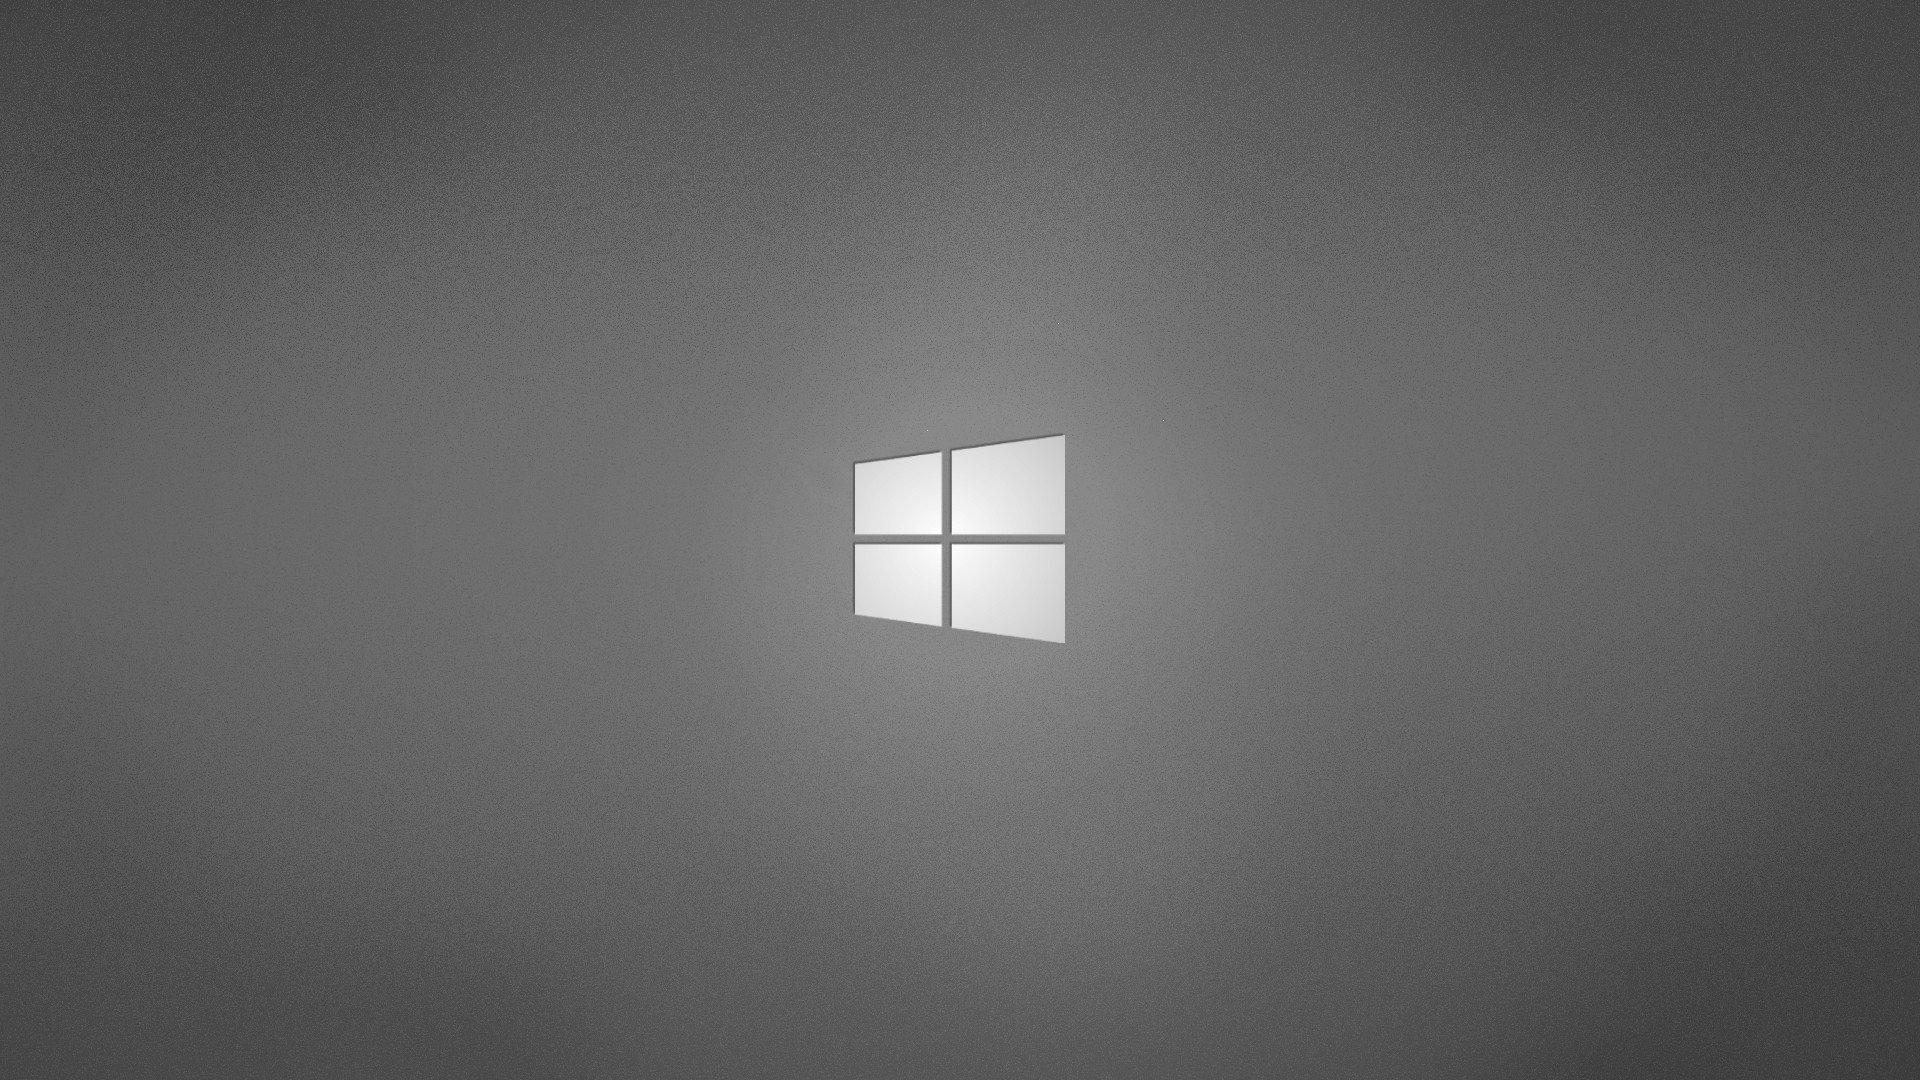 gray grey operating systems windows logo windows wallpaper background 1920x1080